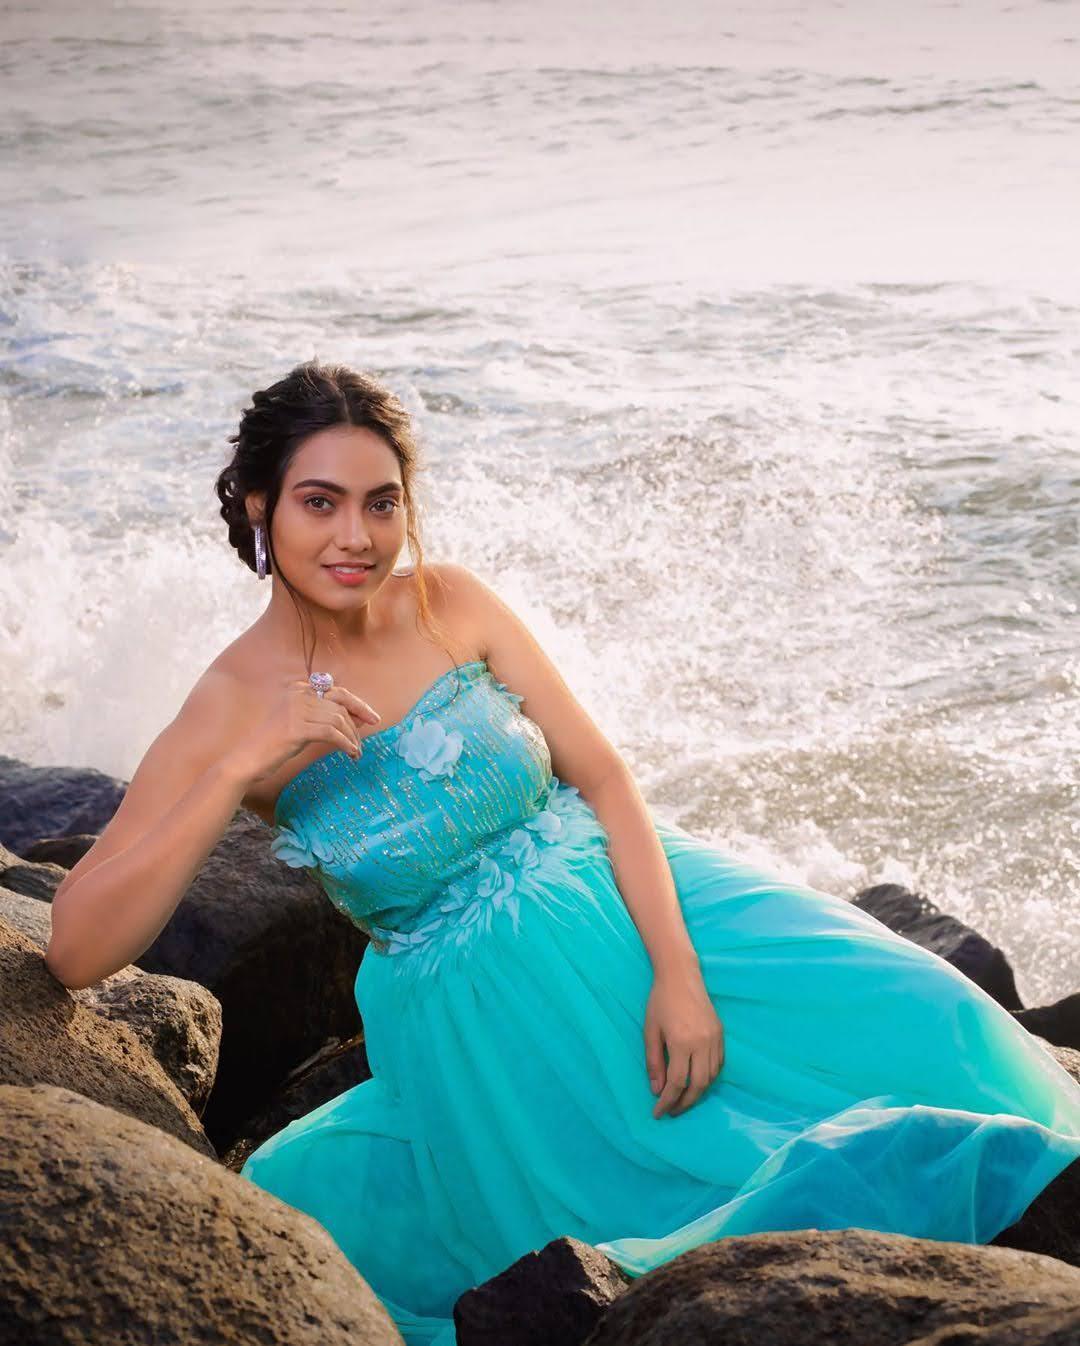 pavithra-janani-64683